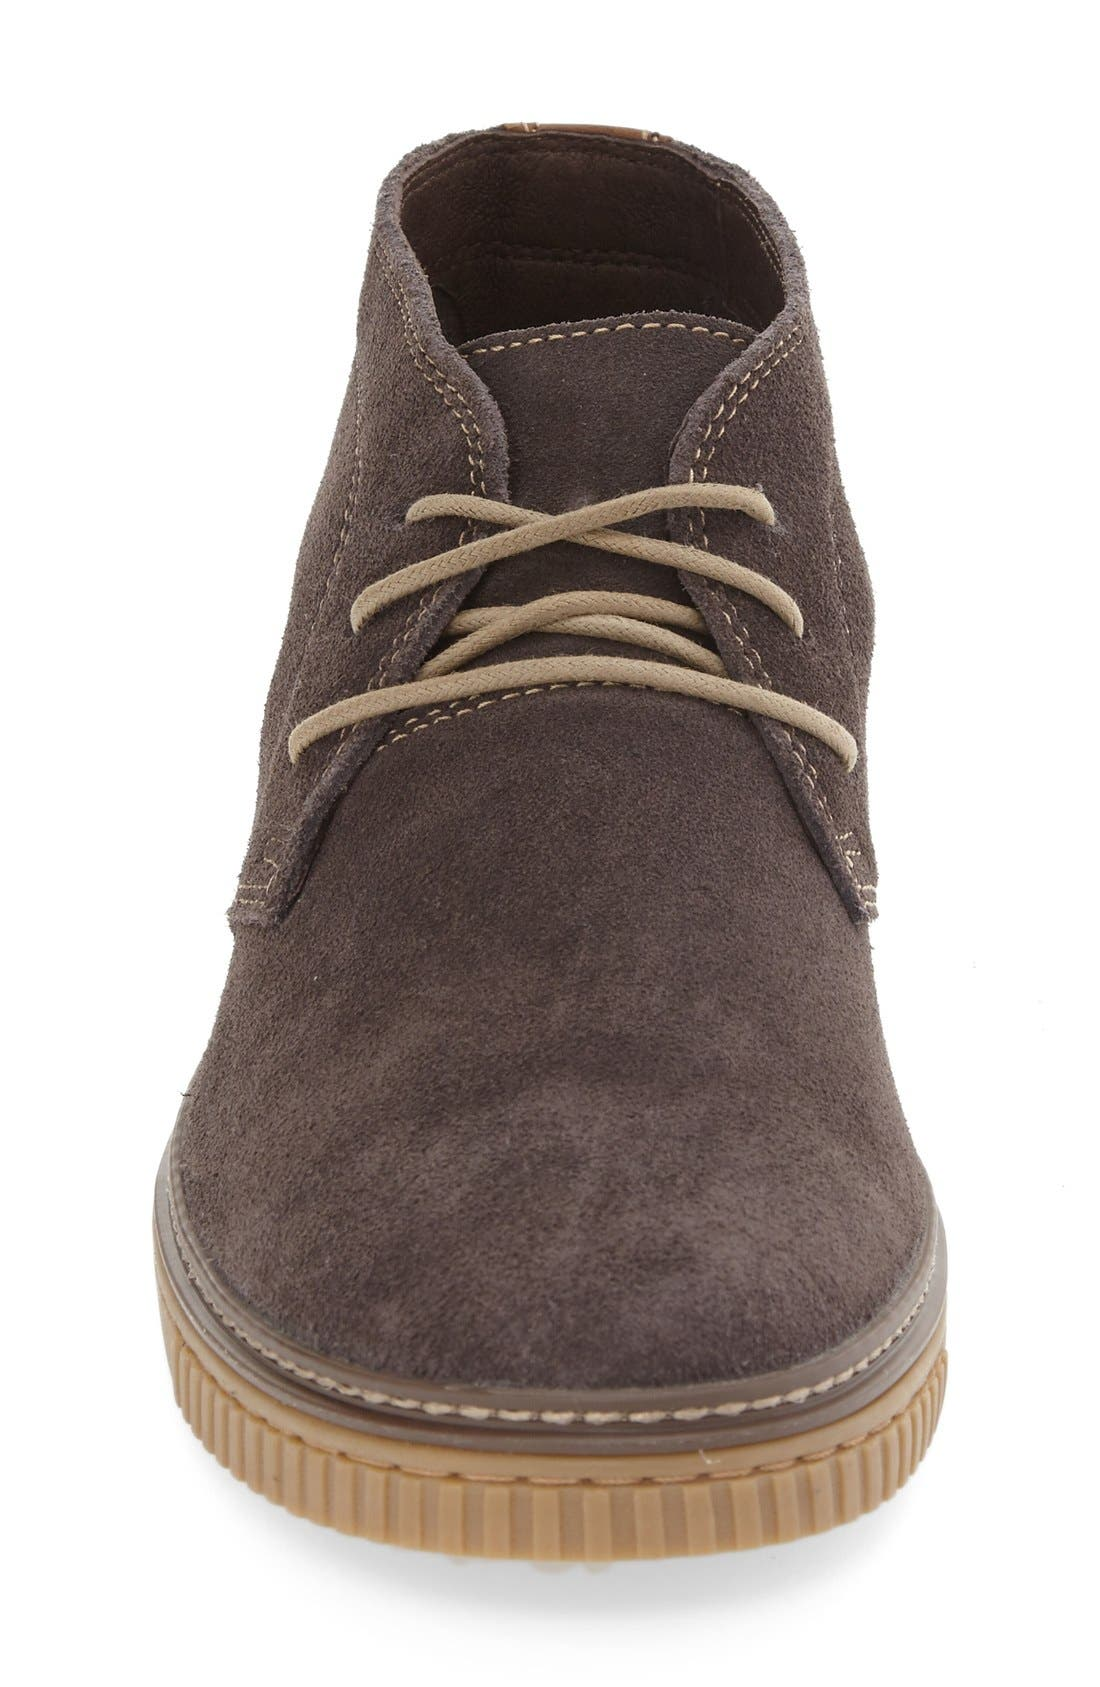 'Wallace' Chukka Boot,                             Alternate thumbnail 2, color,                             020